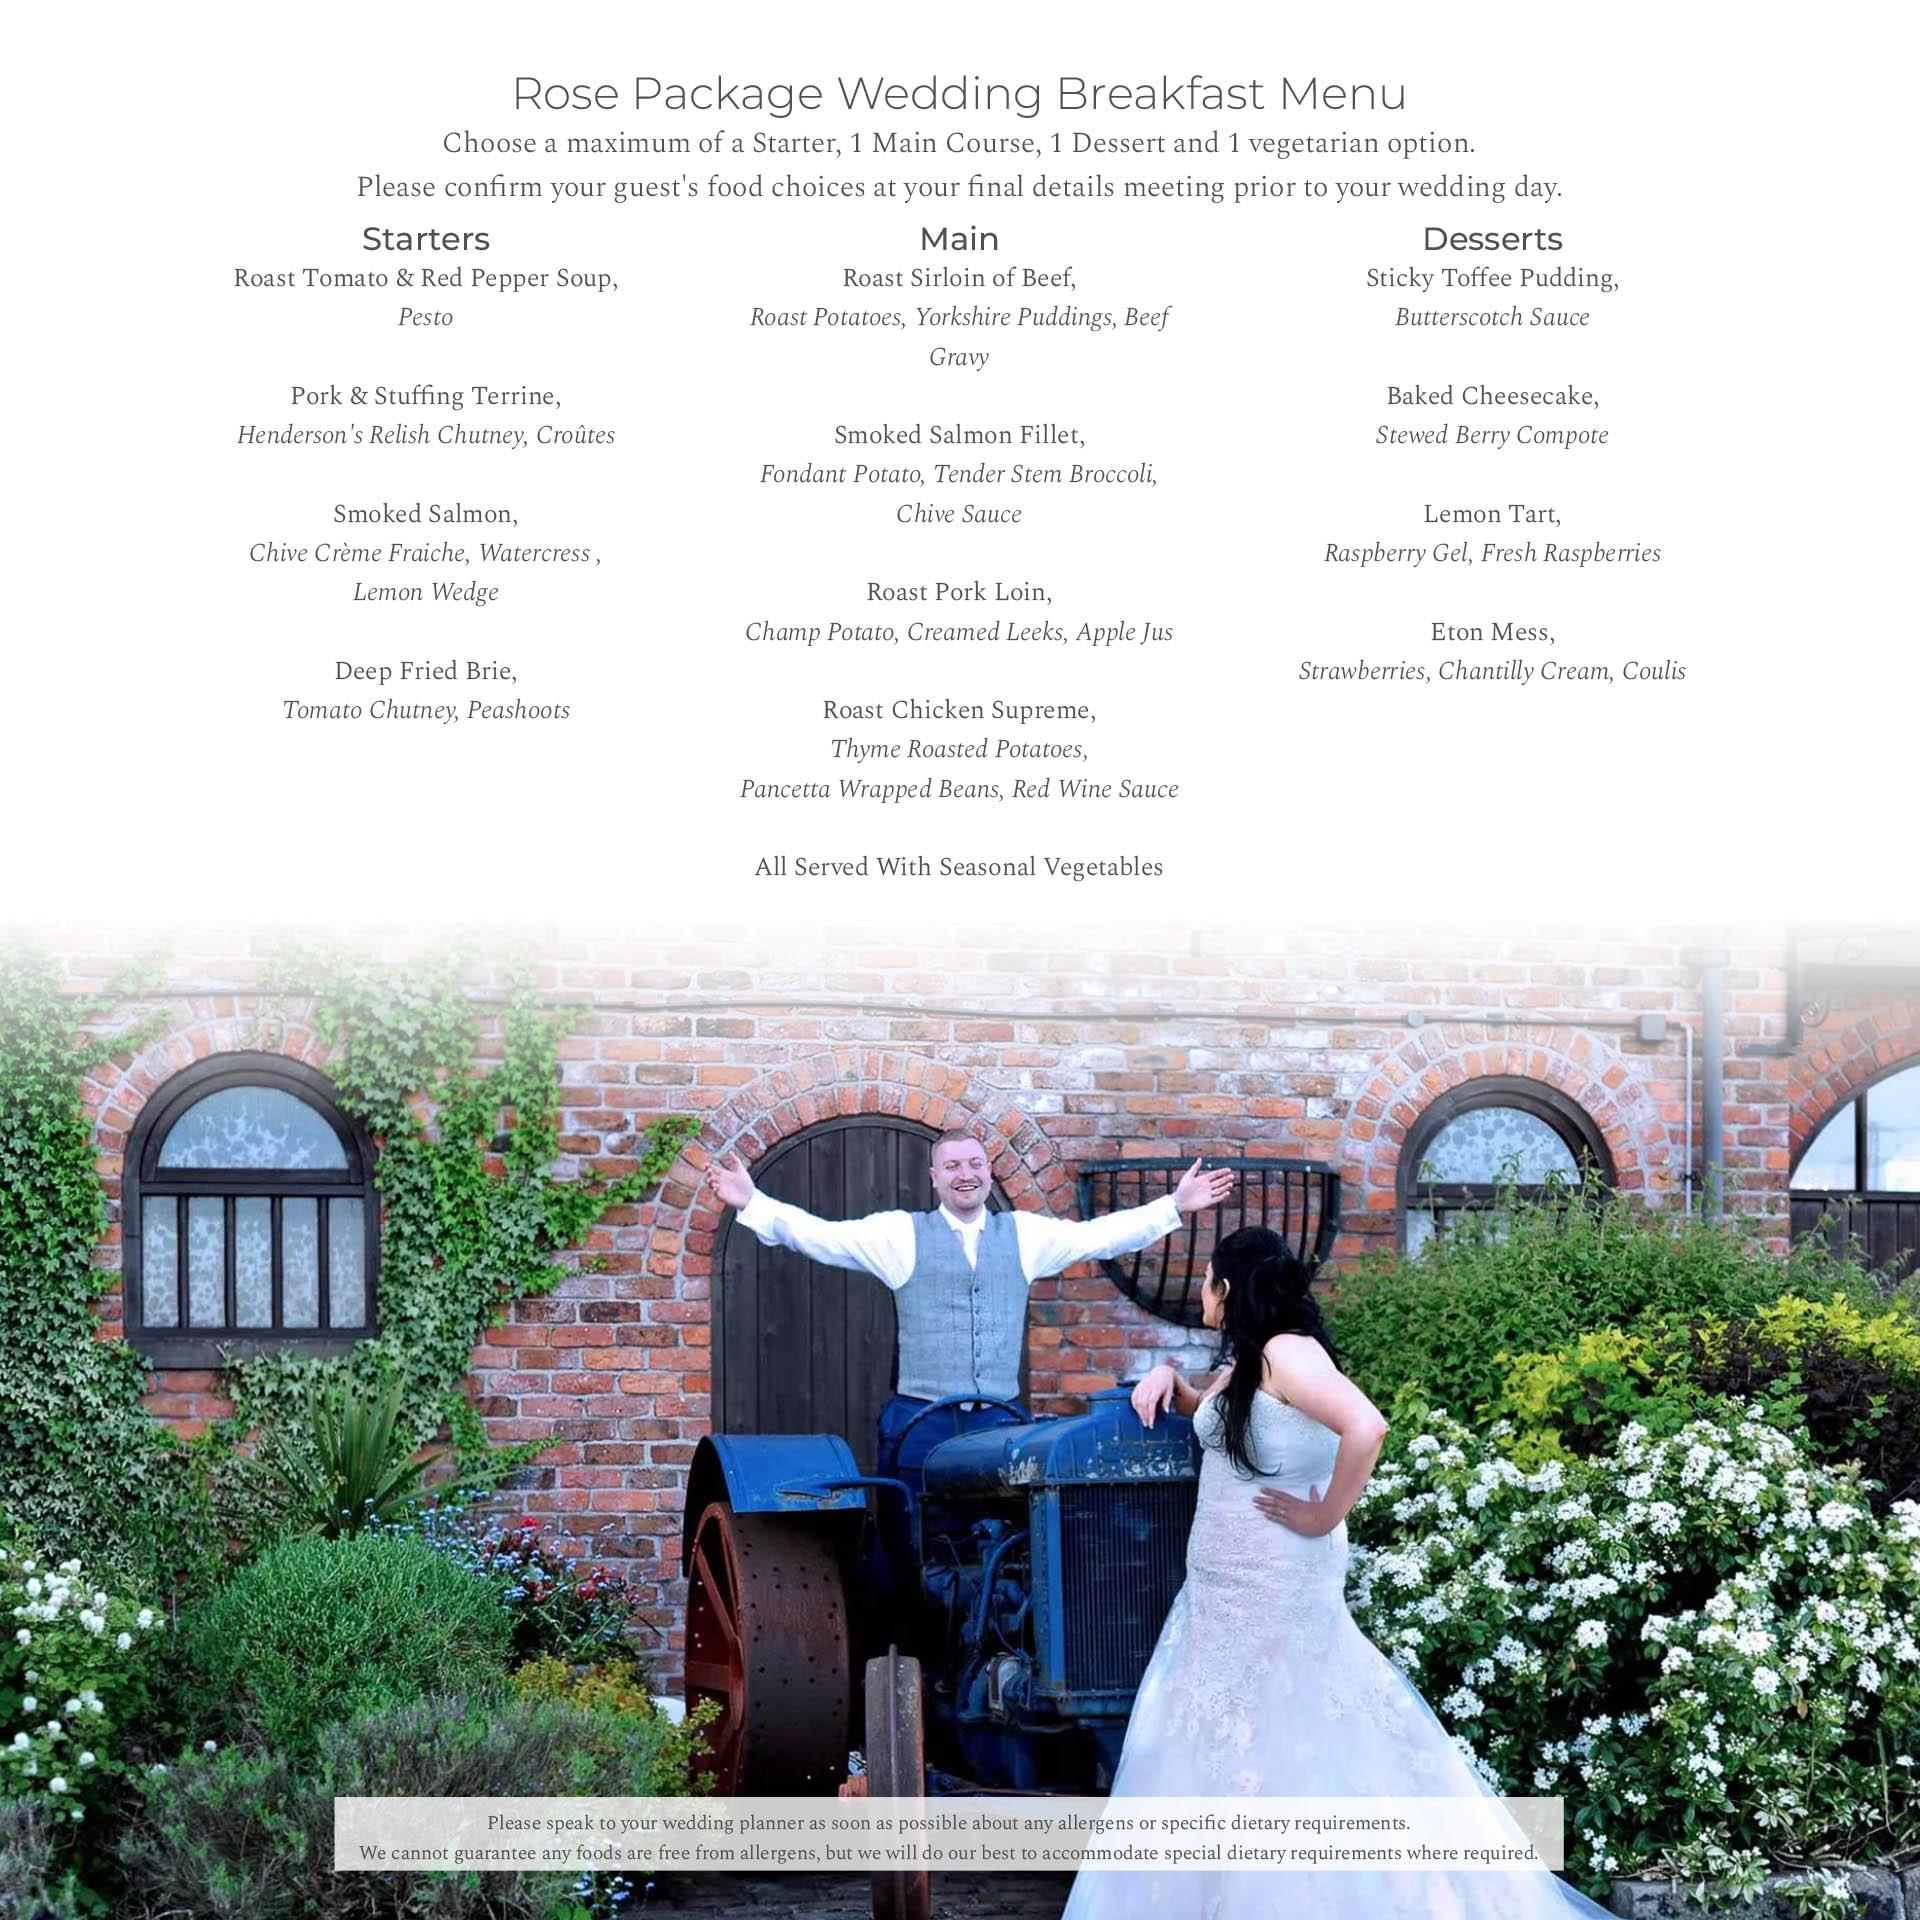 Rose Package Menu Bredbury Hall Wedding Venue in Stockport Cheshire